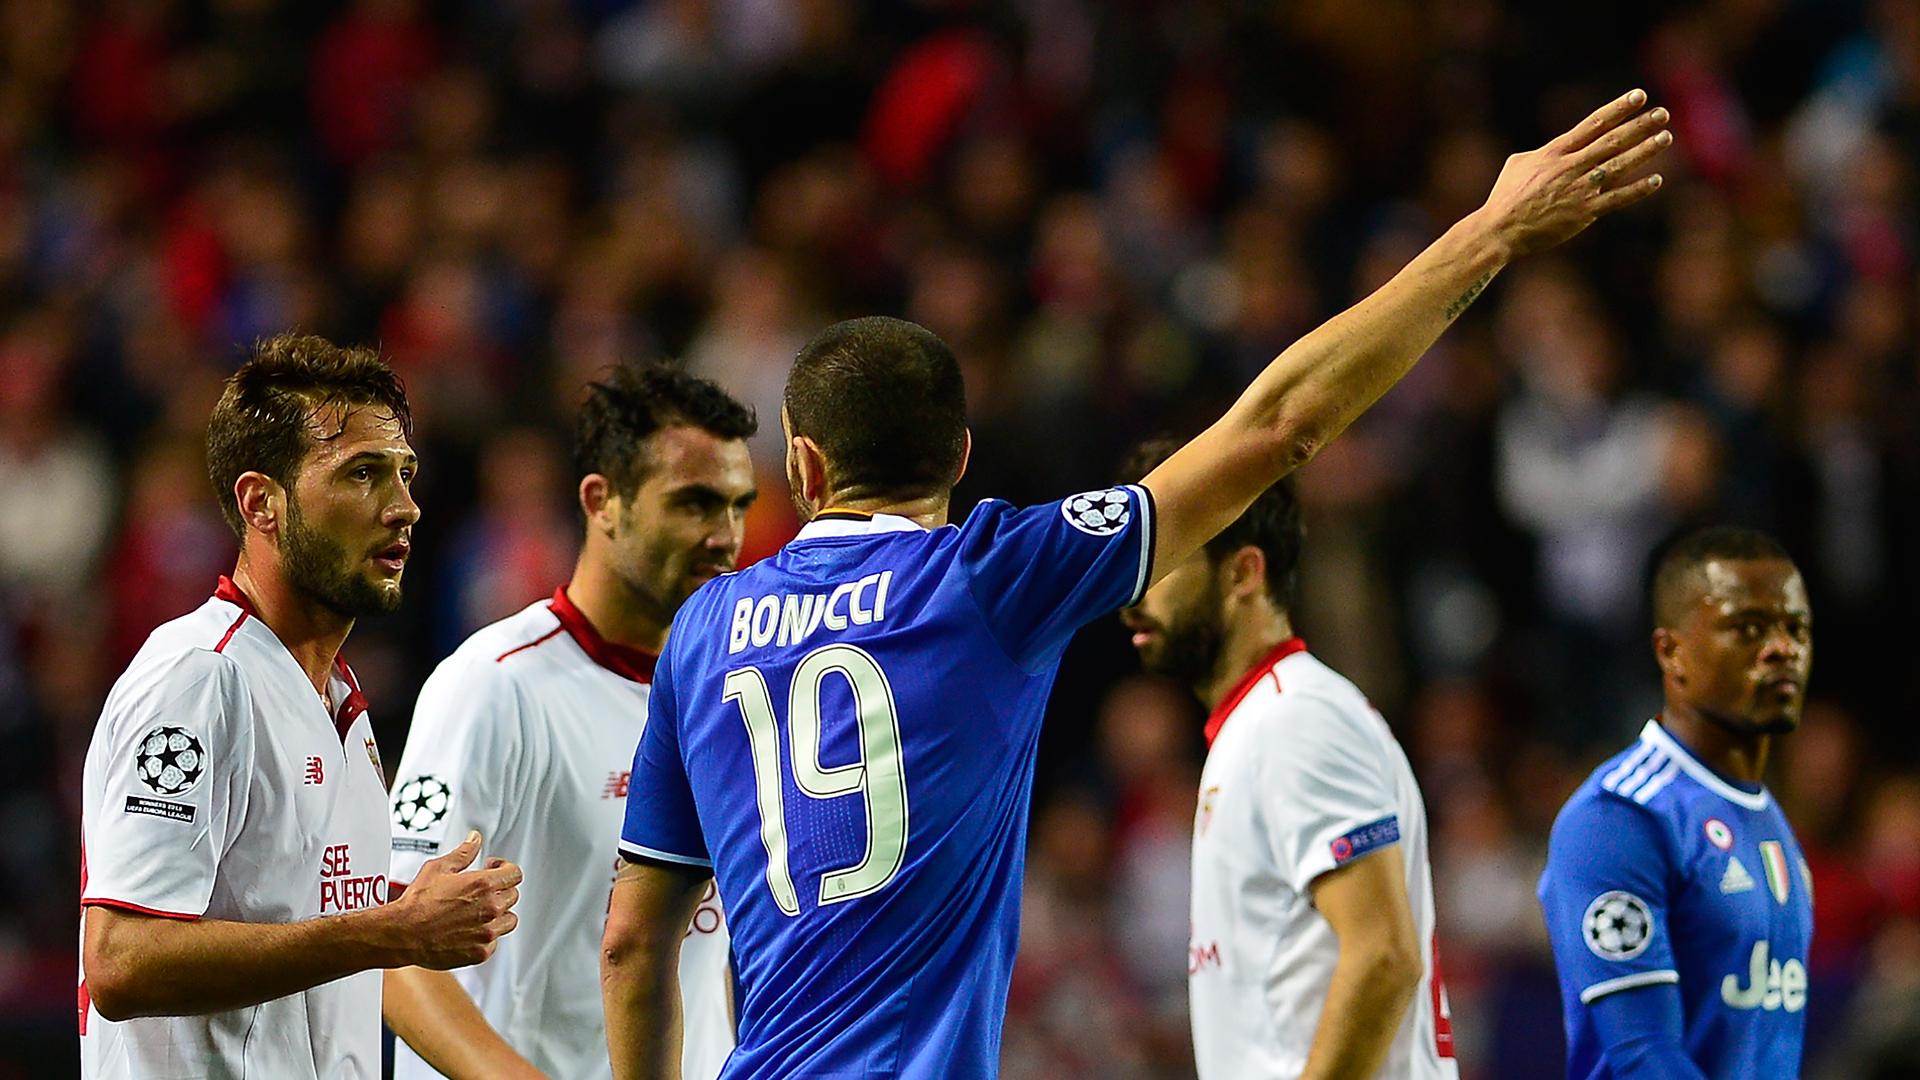 Juventus' mental strength a stark contrast to stupid Sevilla